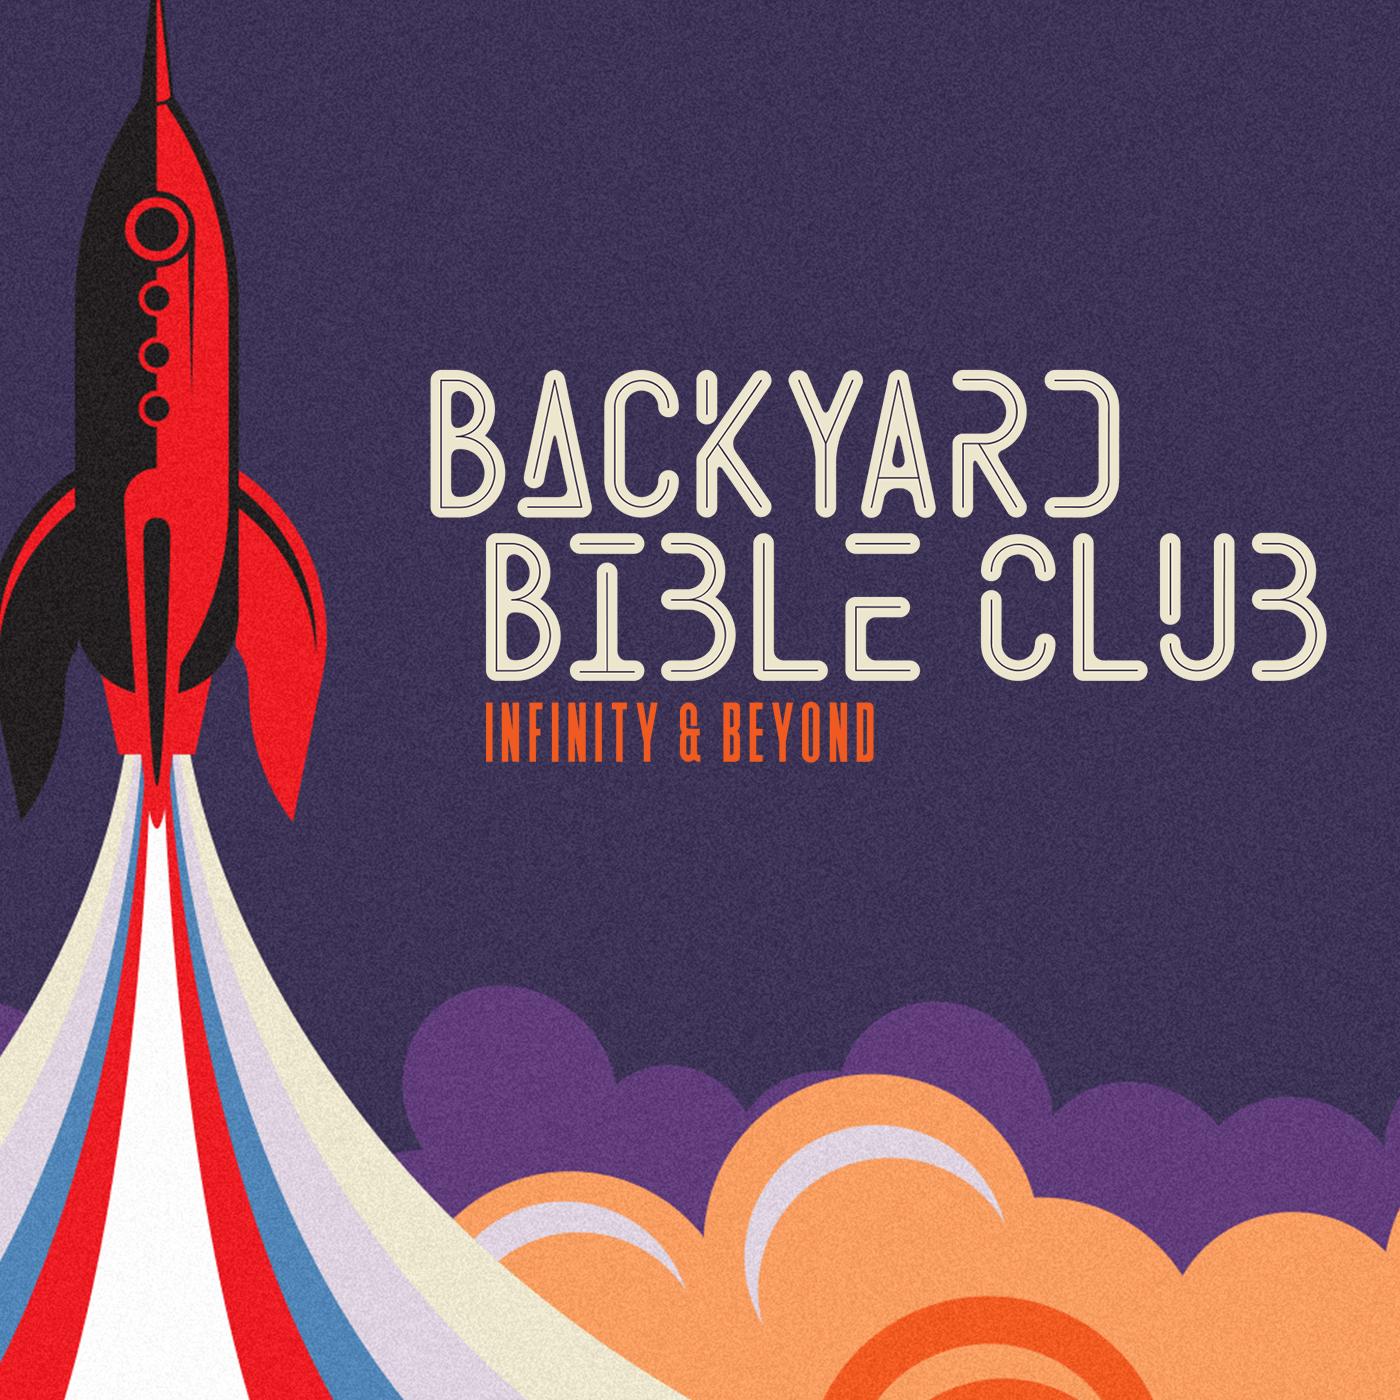 Backyard Bible Square Image.jpg